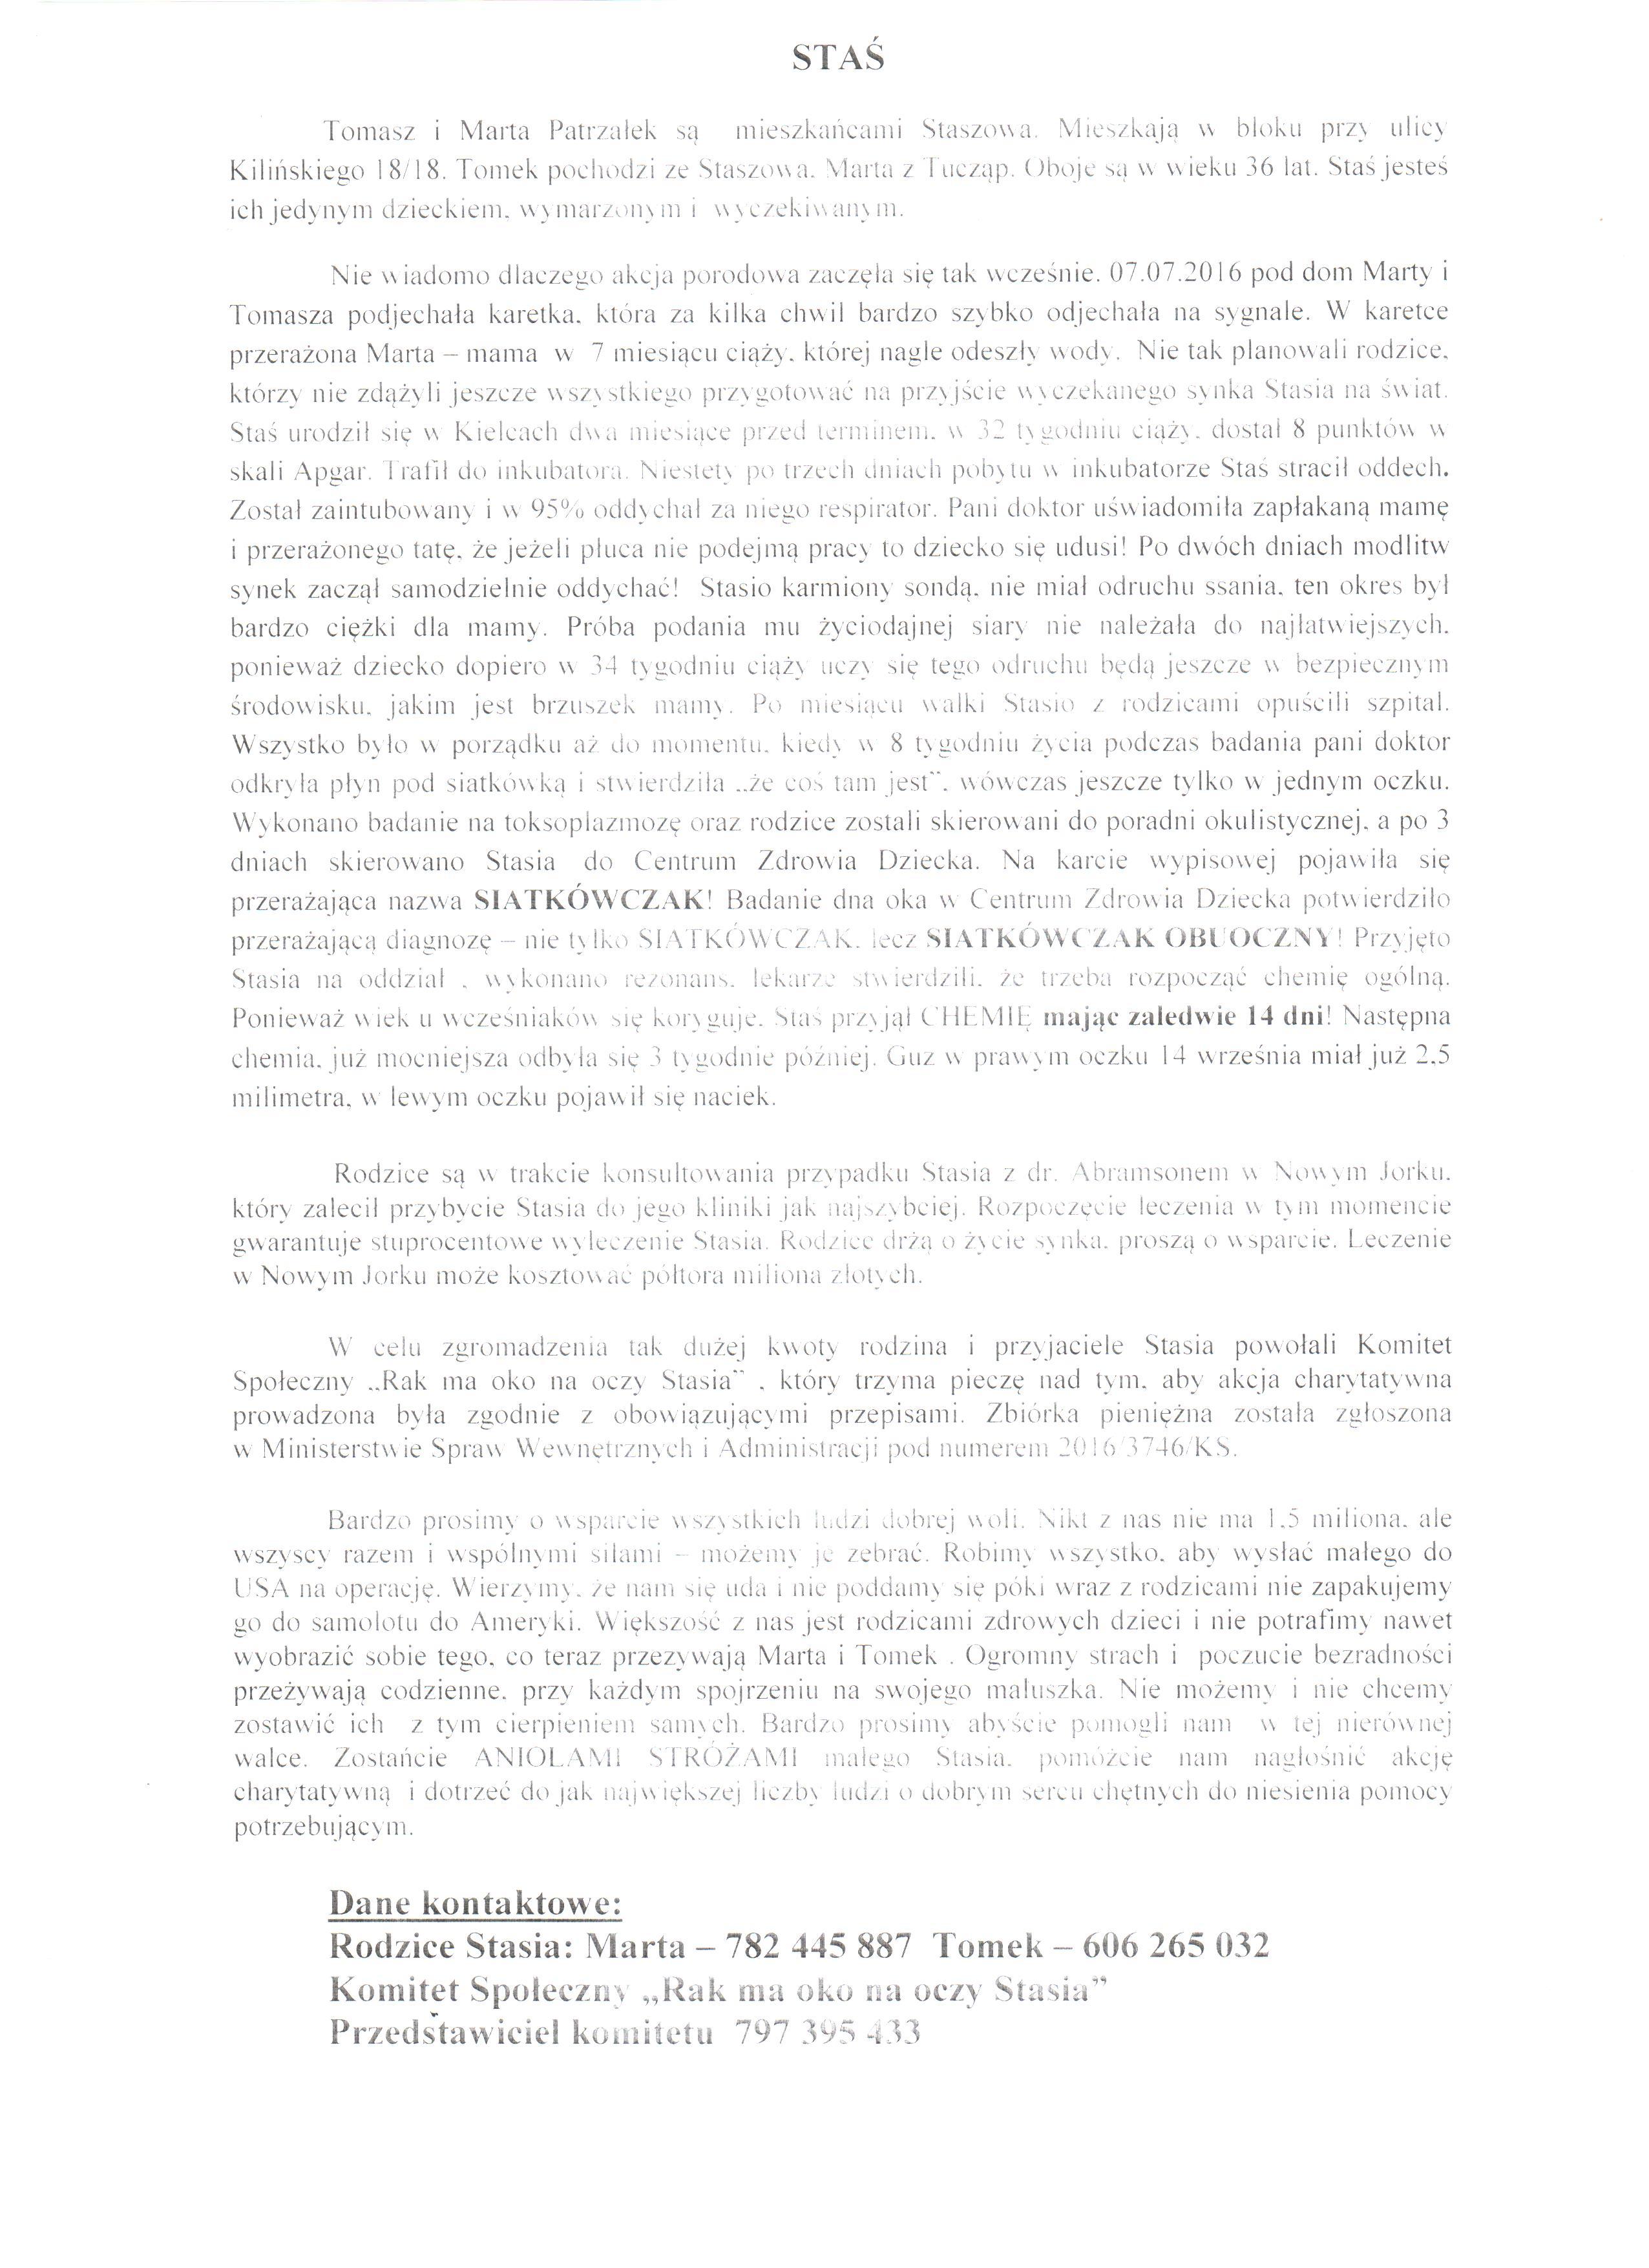 apel_o_pomoc-2fp-1